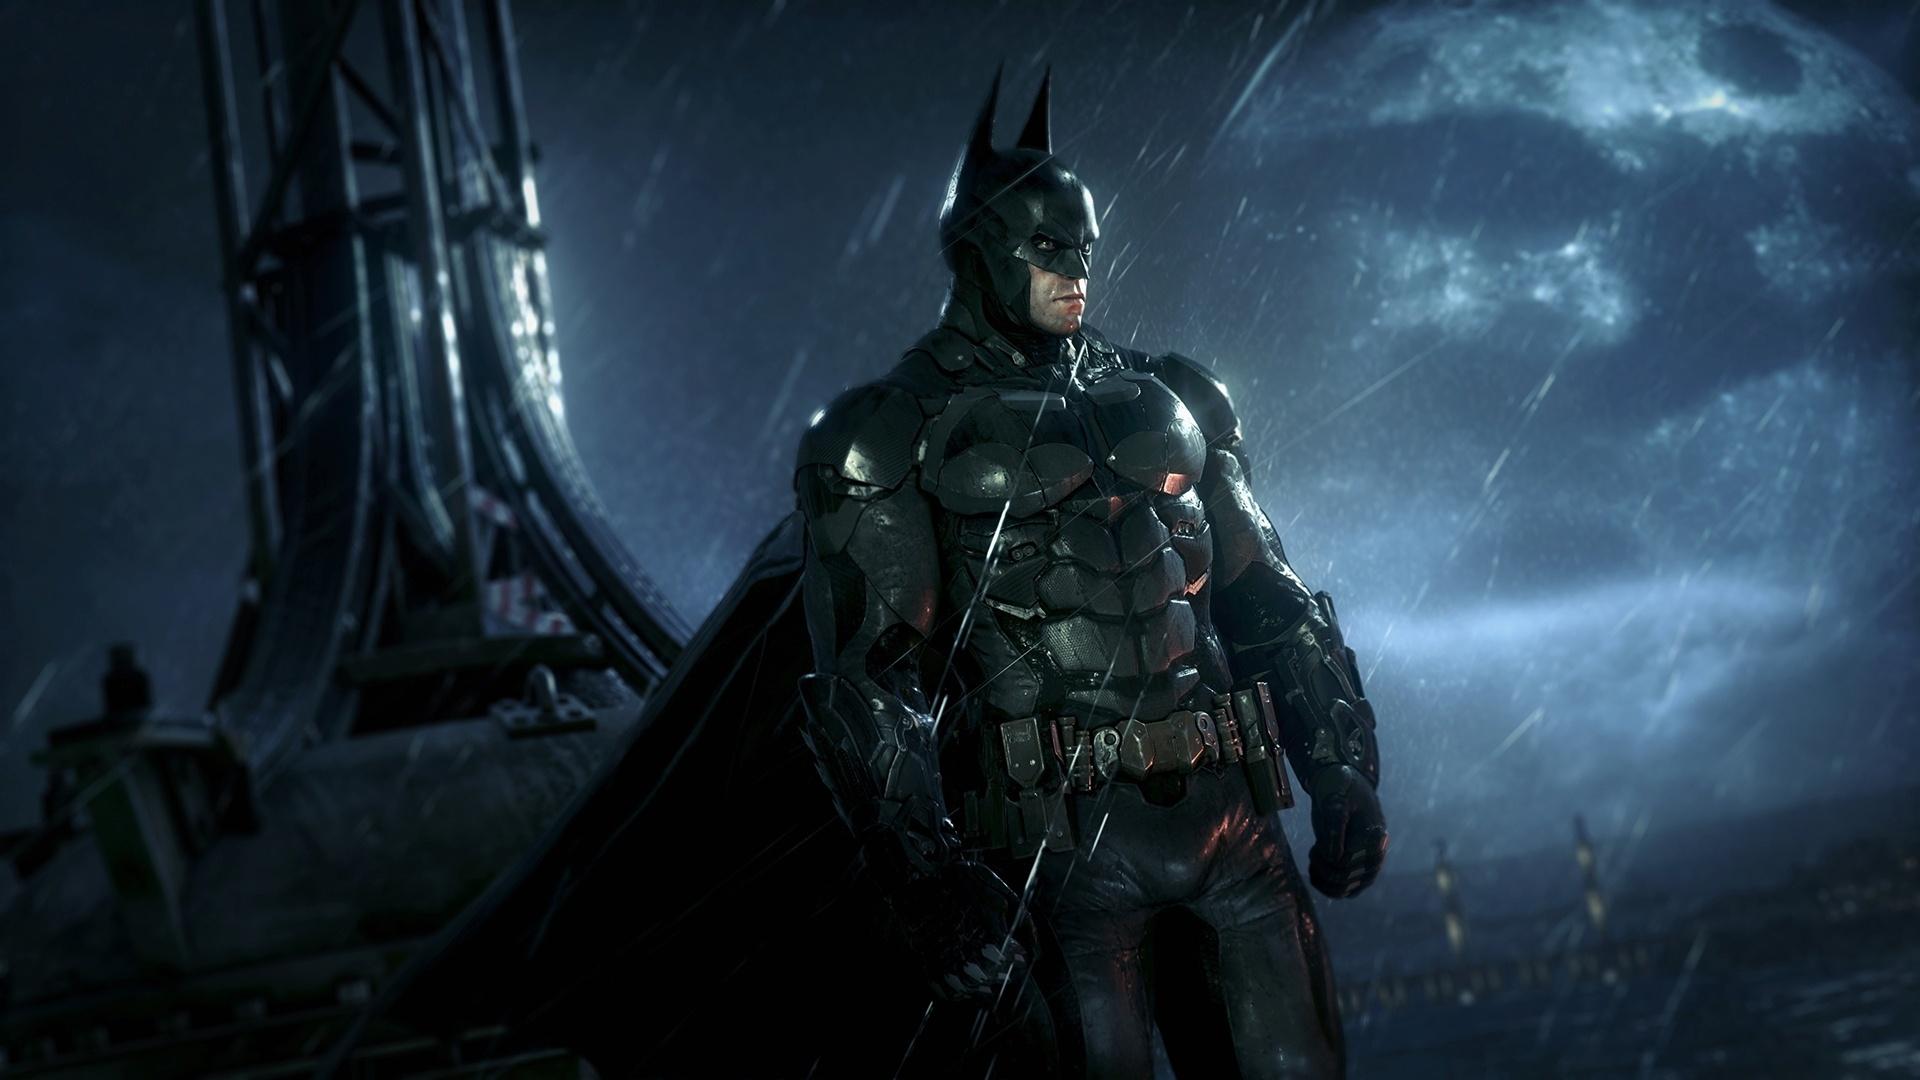 Batman Arkham Knight Wallpaper 6